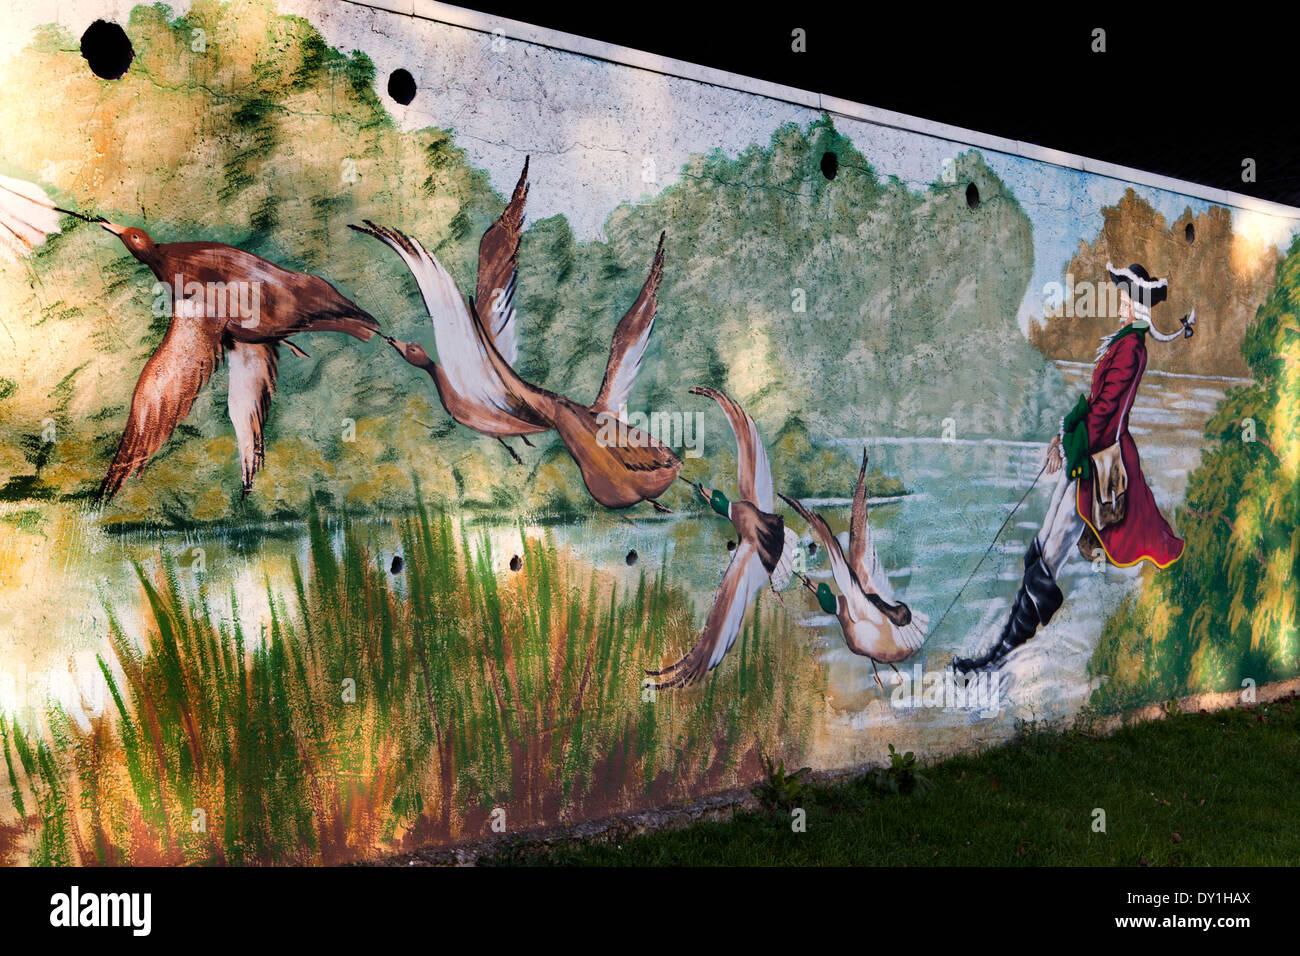 Baron Muenchhausen, Graffiti, Bodenwerder, Weserbergland, Lower Saxony, Germany Stock Photo